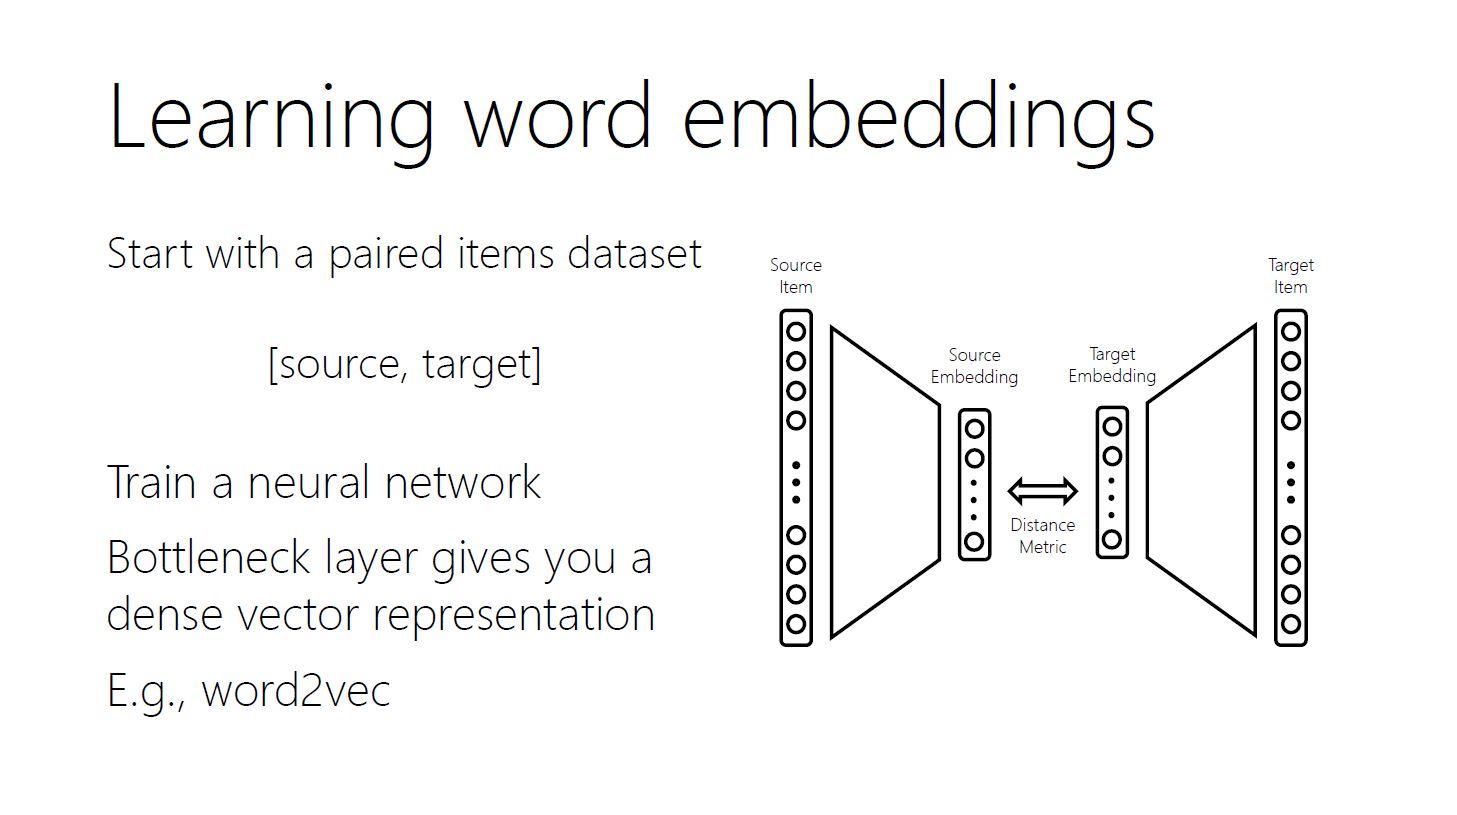 using-text-embeddings-for-information-retrieval-6-638